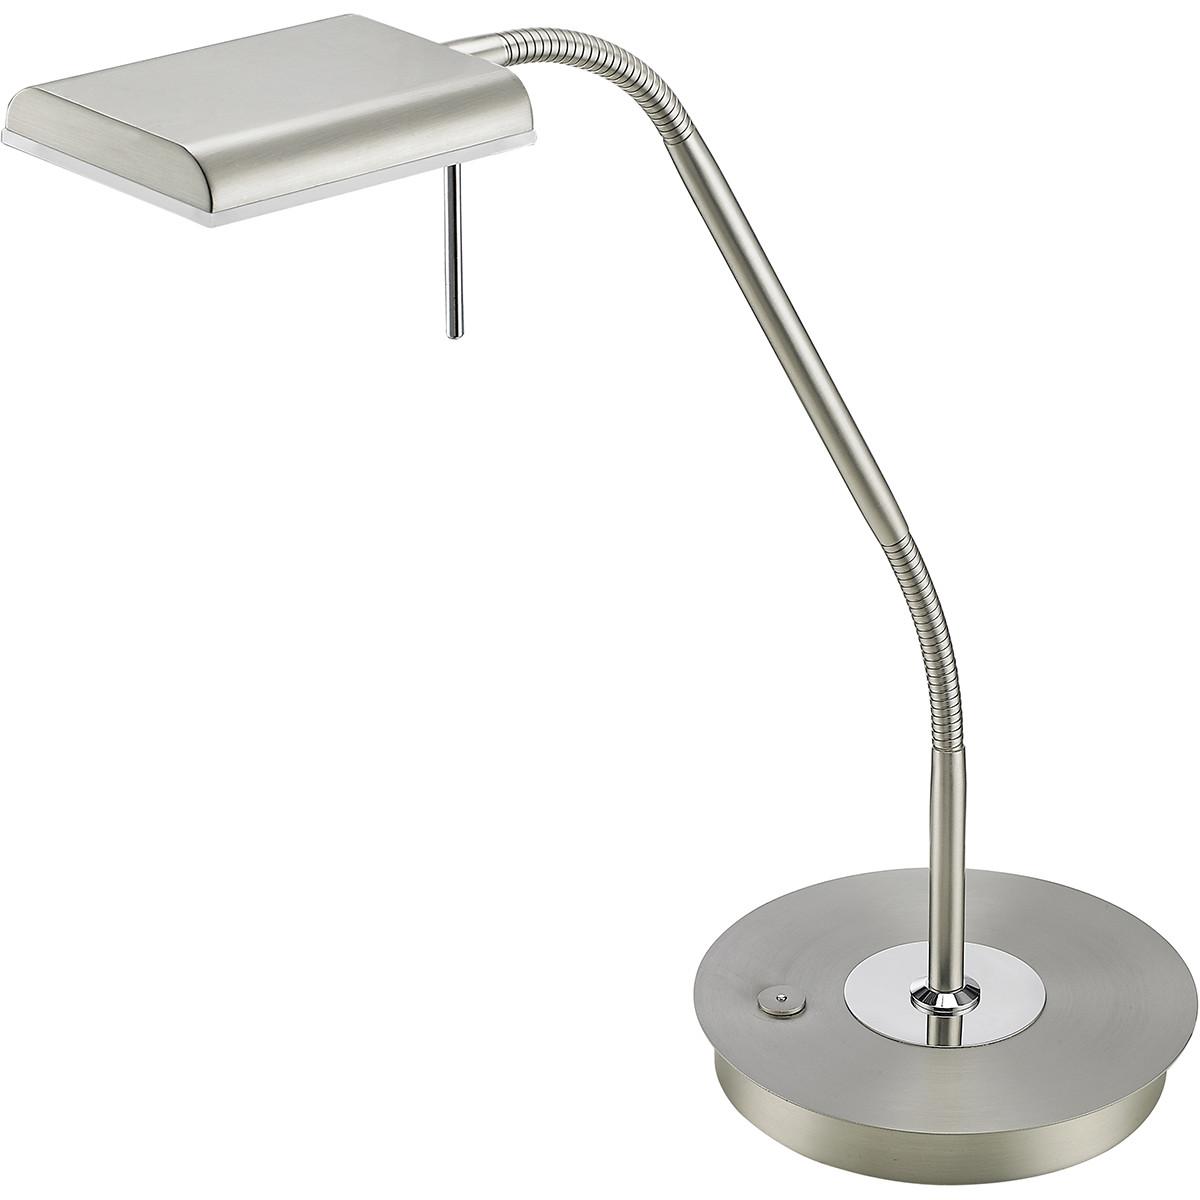 LED Tafellamp - Trion Bernaro - 12W - Warm Wit 3000K - Dimbaar - Rond - Mat Nikk